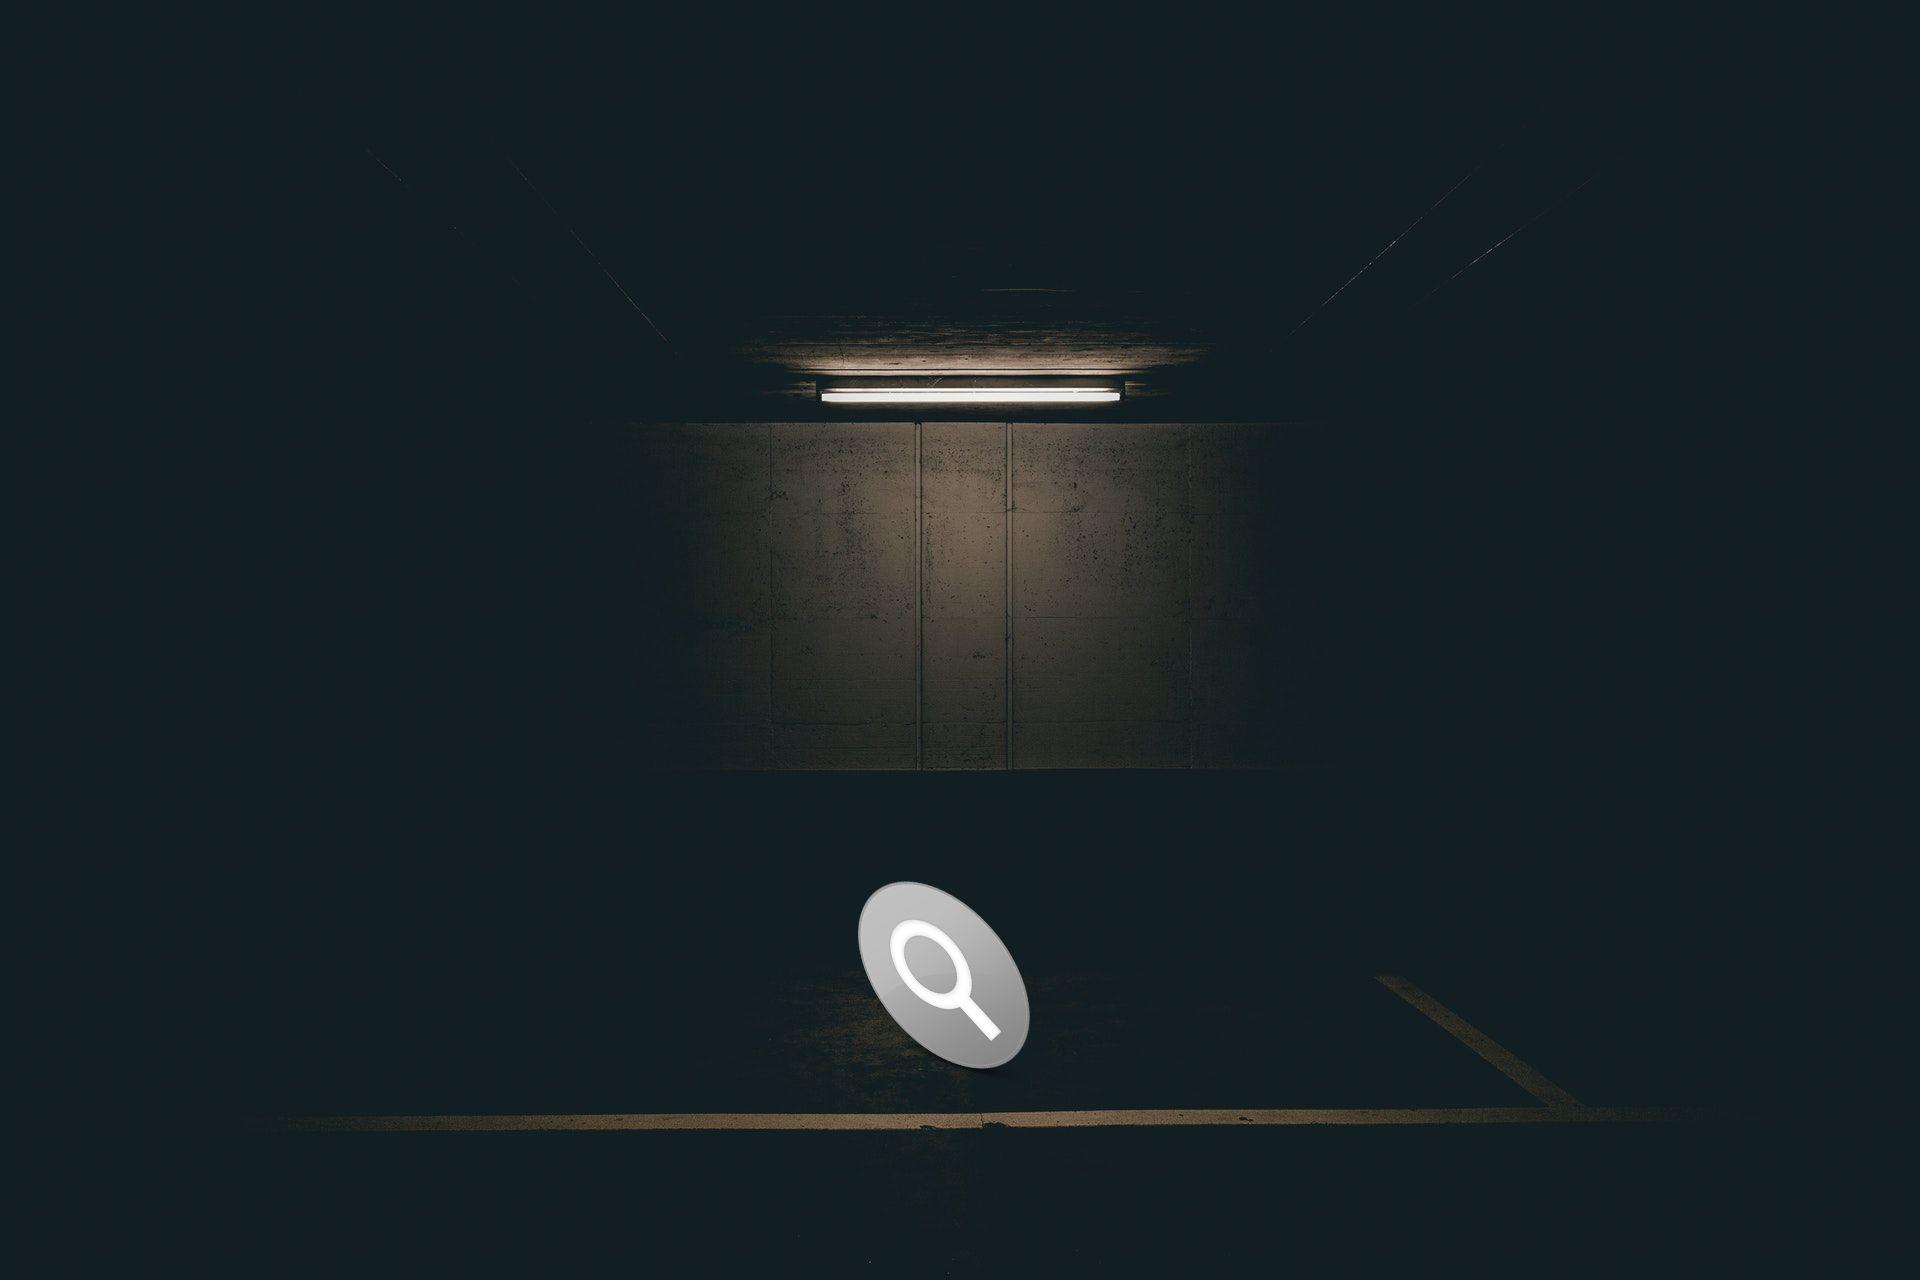 MacのSpotlight検索結果画面でファイルパスを確認する方法ーアイキャッチ